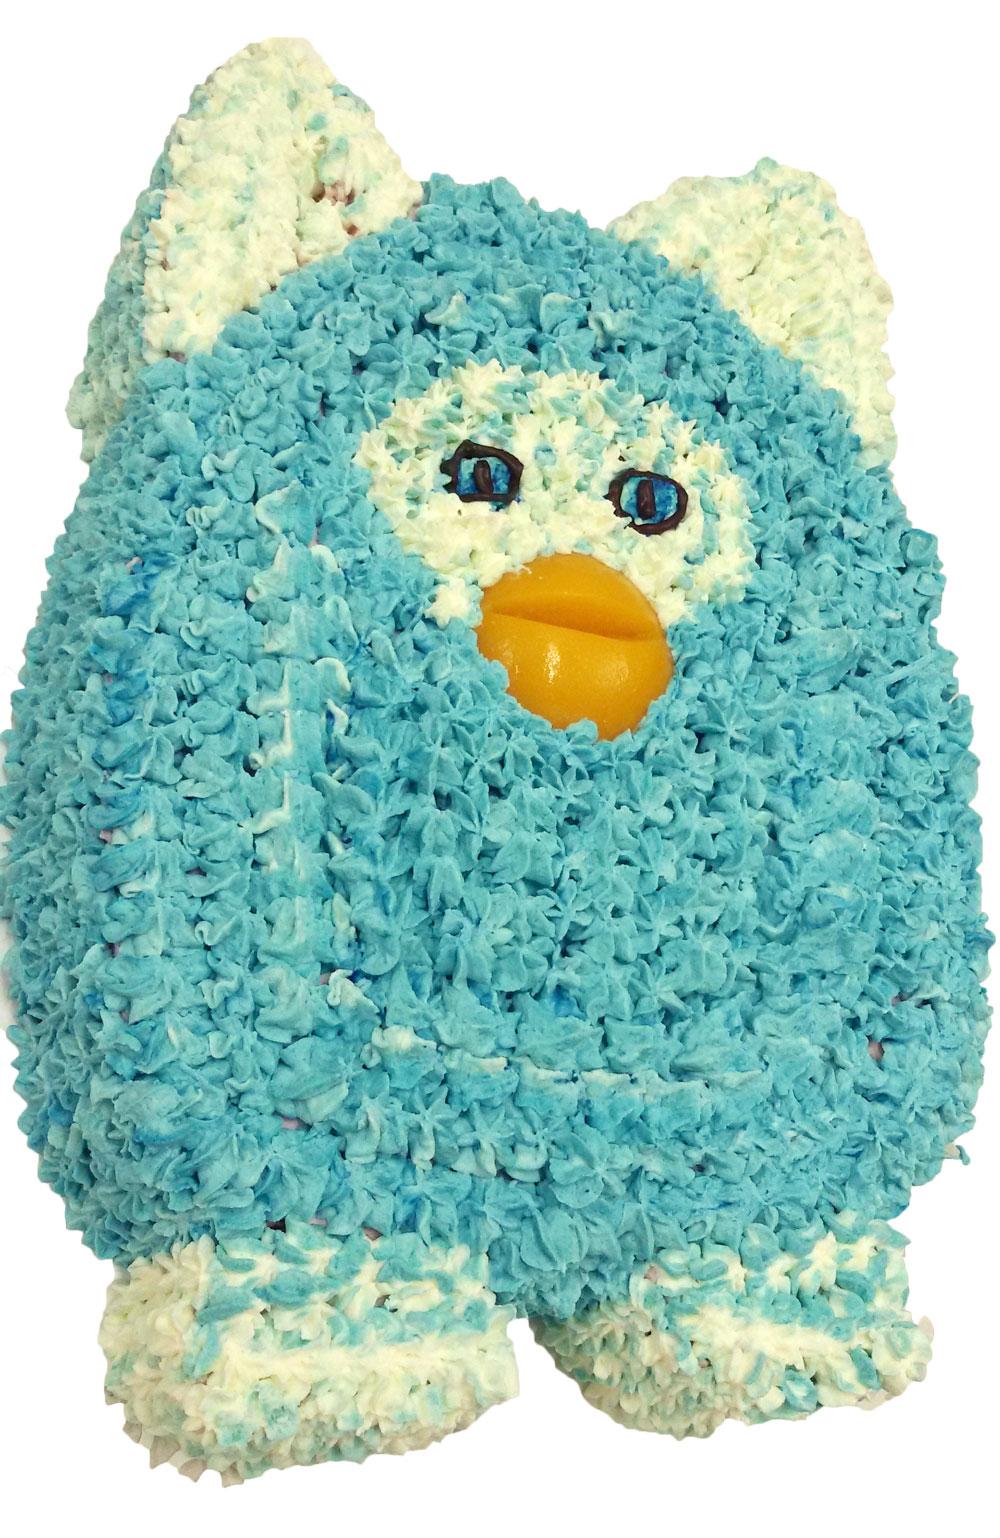 Nowy tort w Cukierni Markiza Stare Babice - Furby!